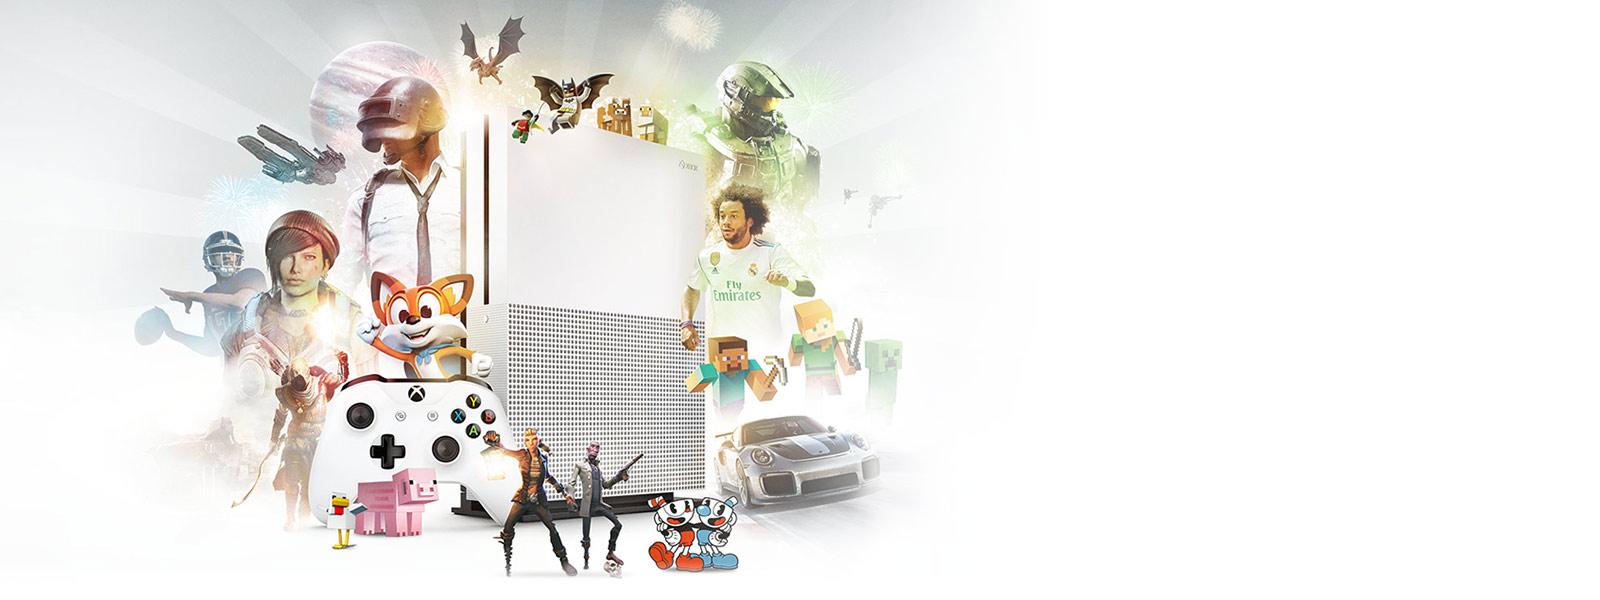 Xbox One S と Xbox ワイヤレス コントローラーの周りに Xbox ゲーム画面のコラージュ